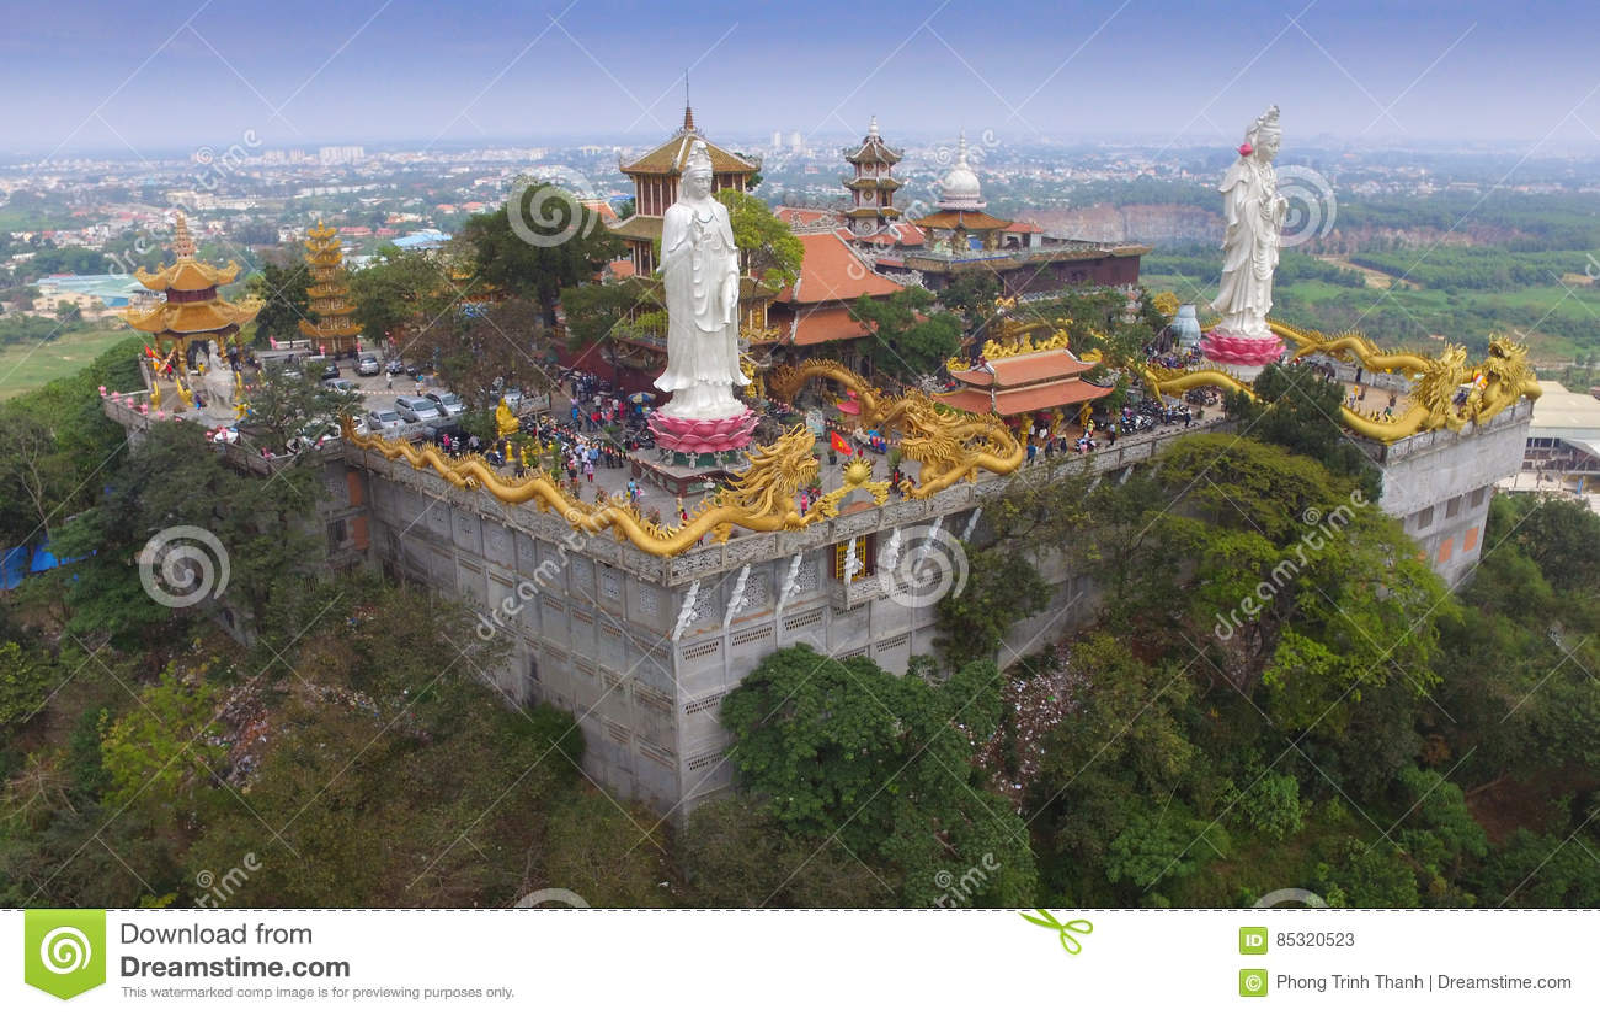 BinhDuong Wietnam